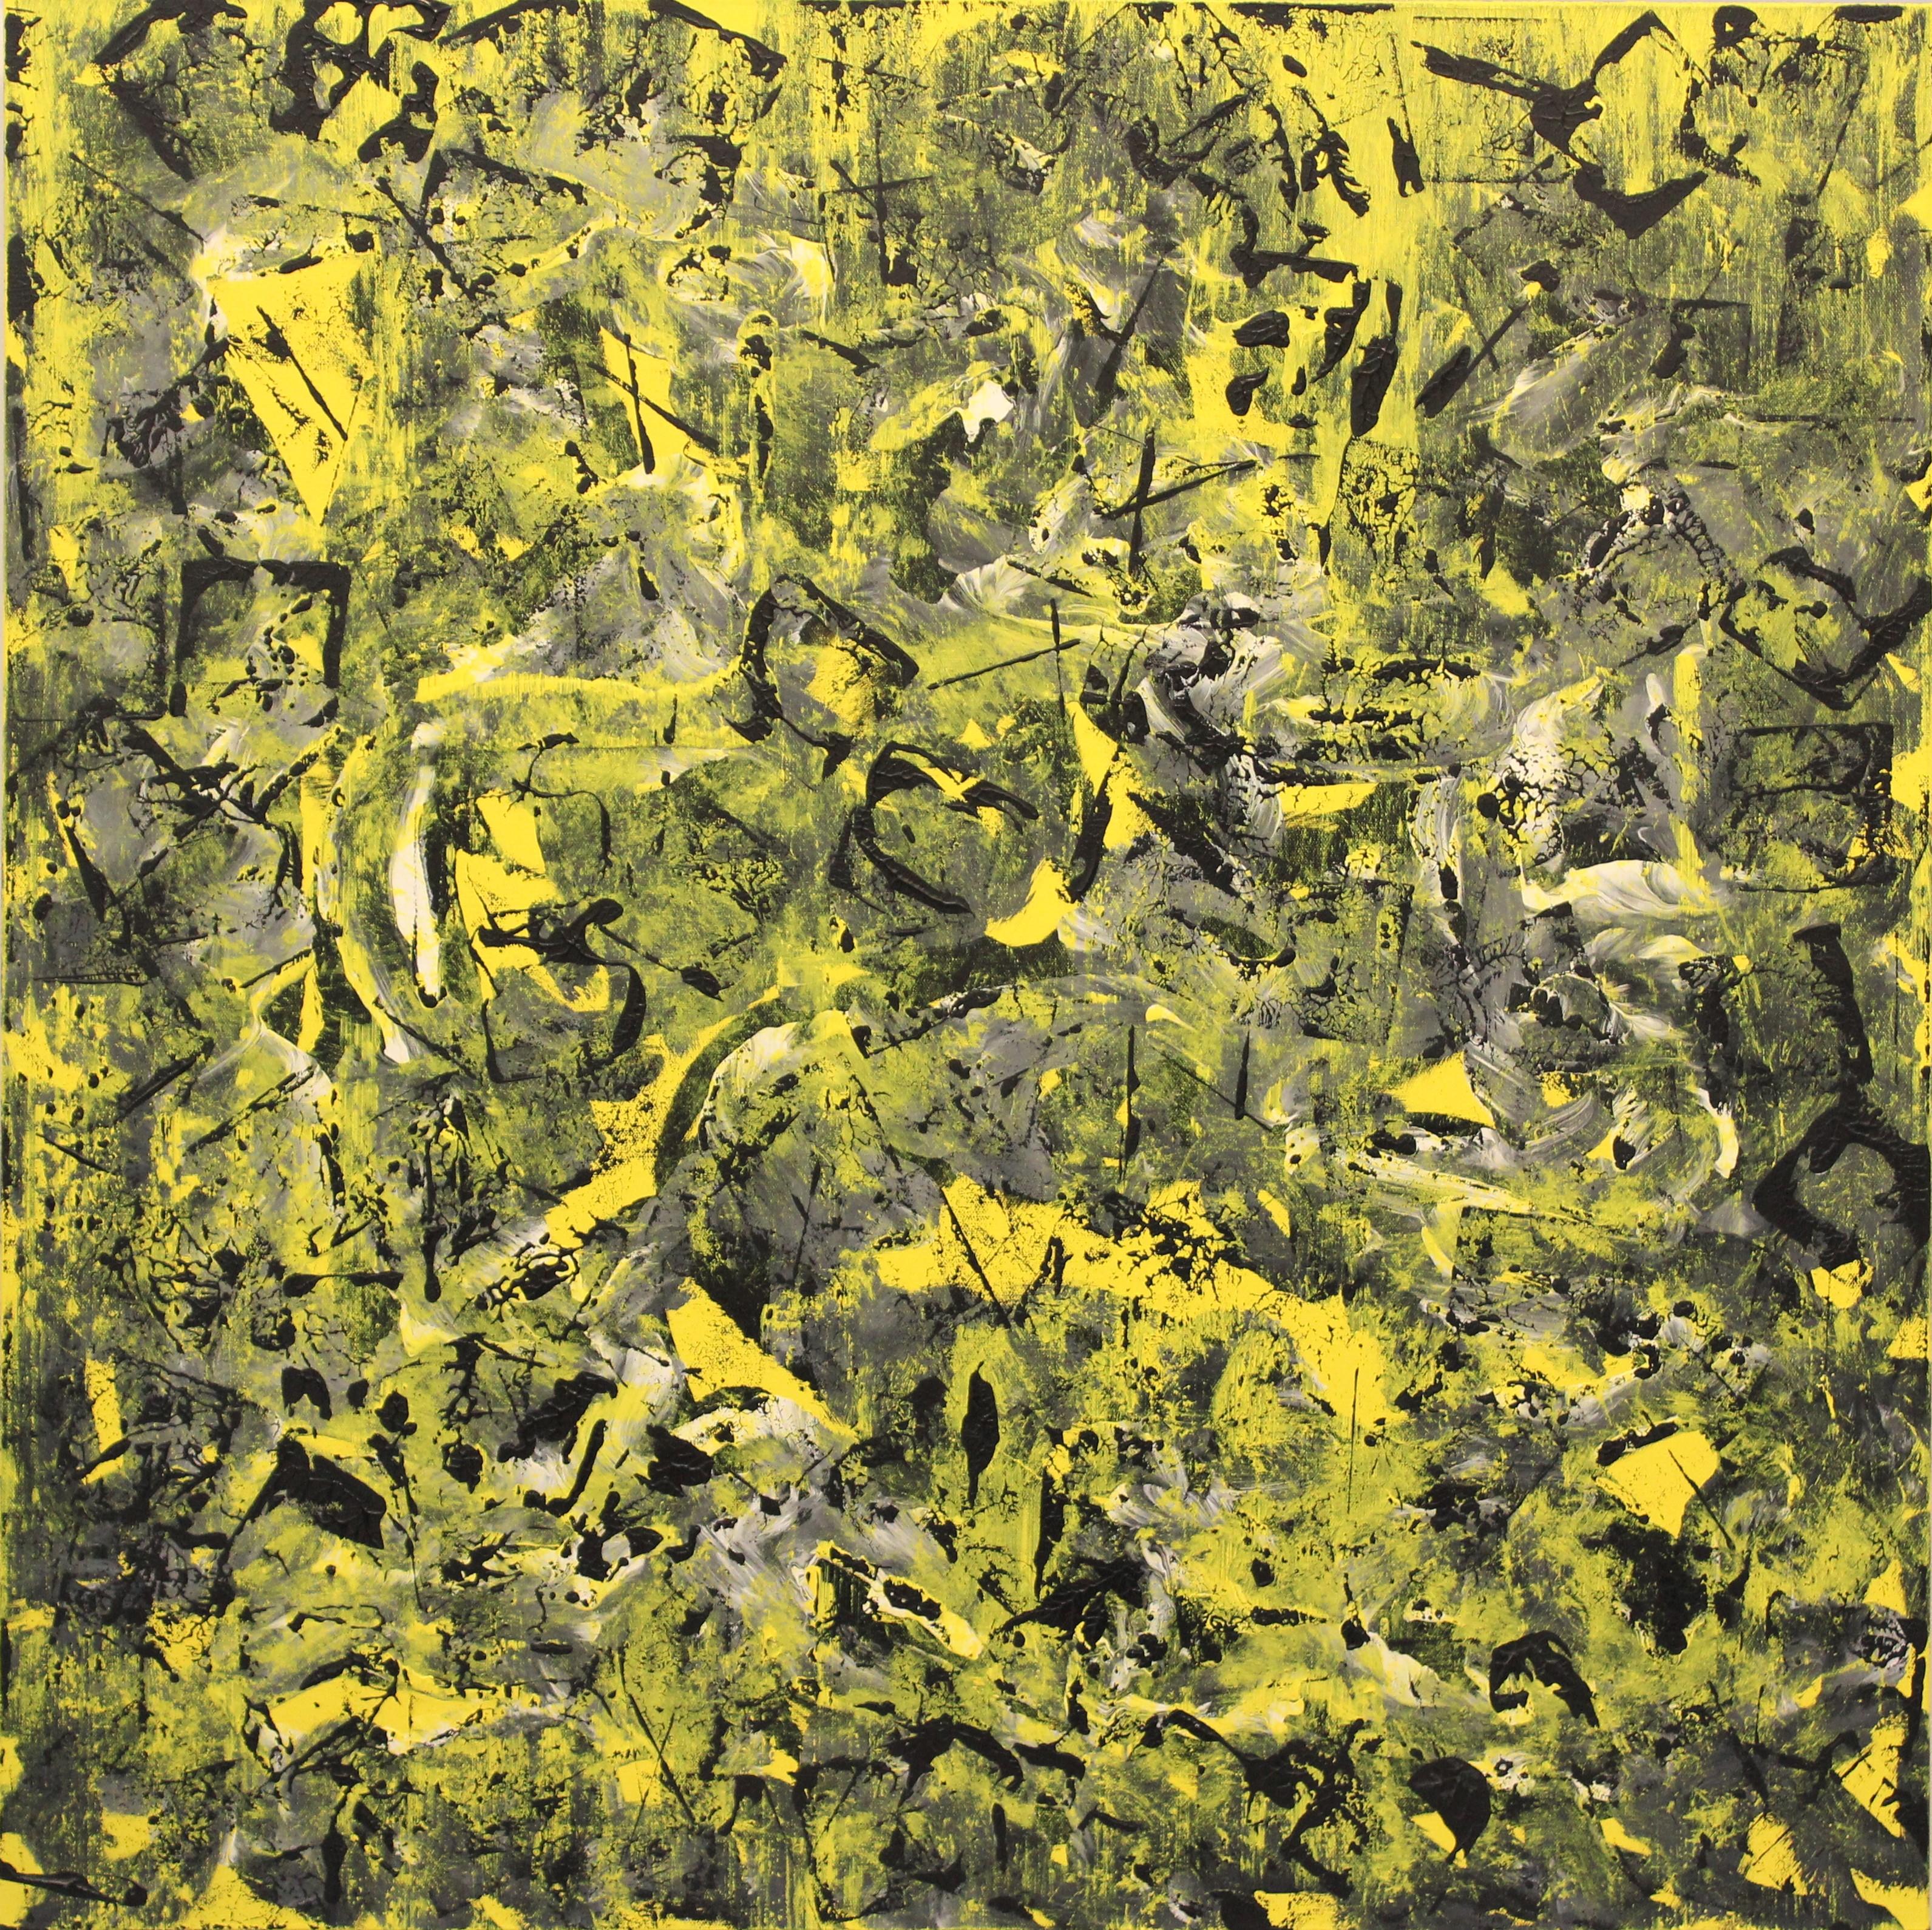 G kim Hinkson Frolicking Abstract Acrylic Painting 36x36